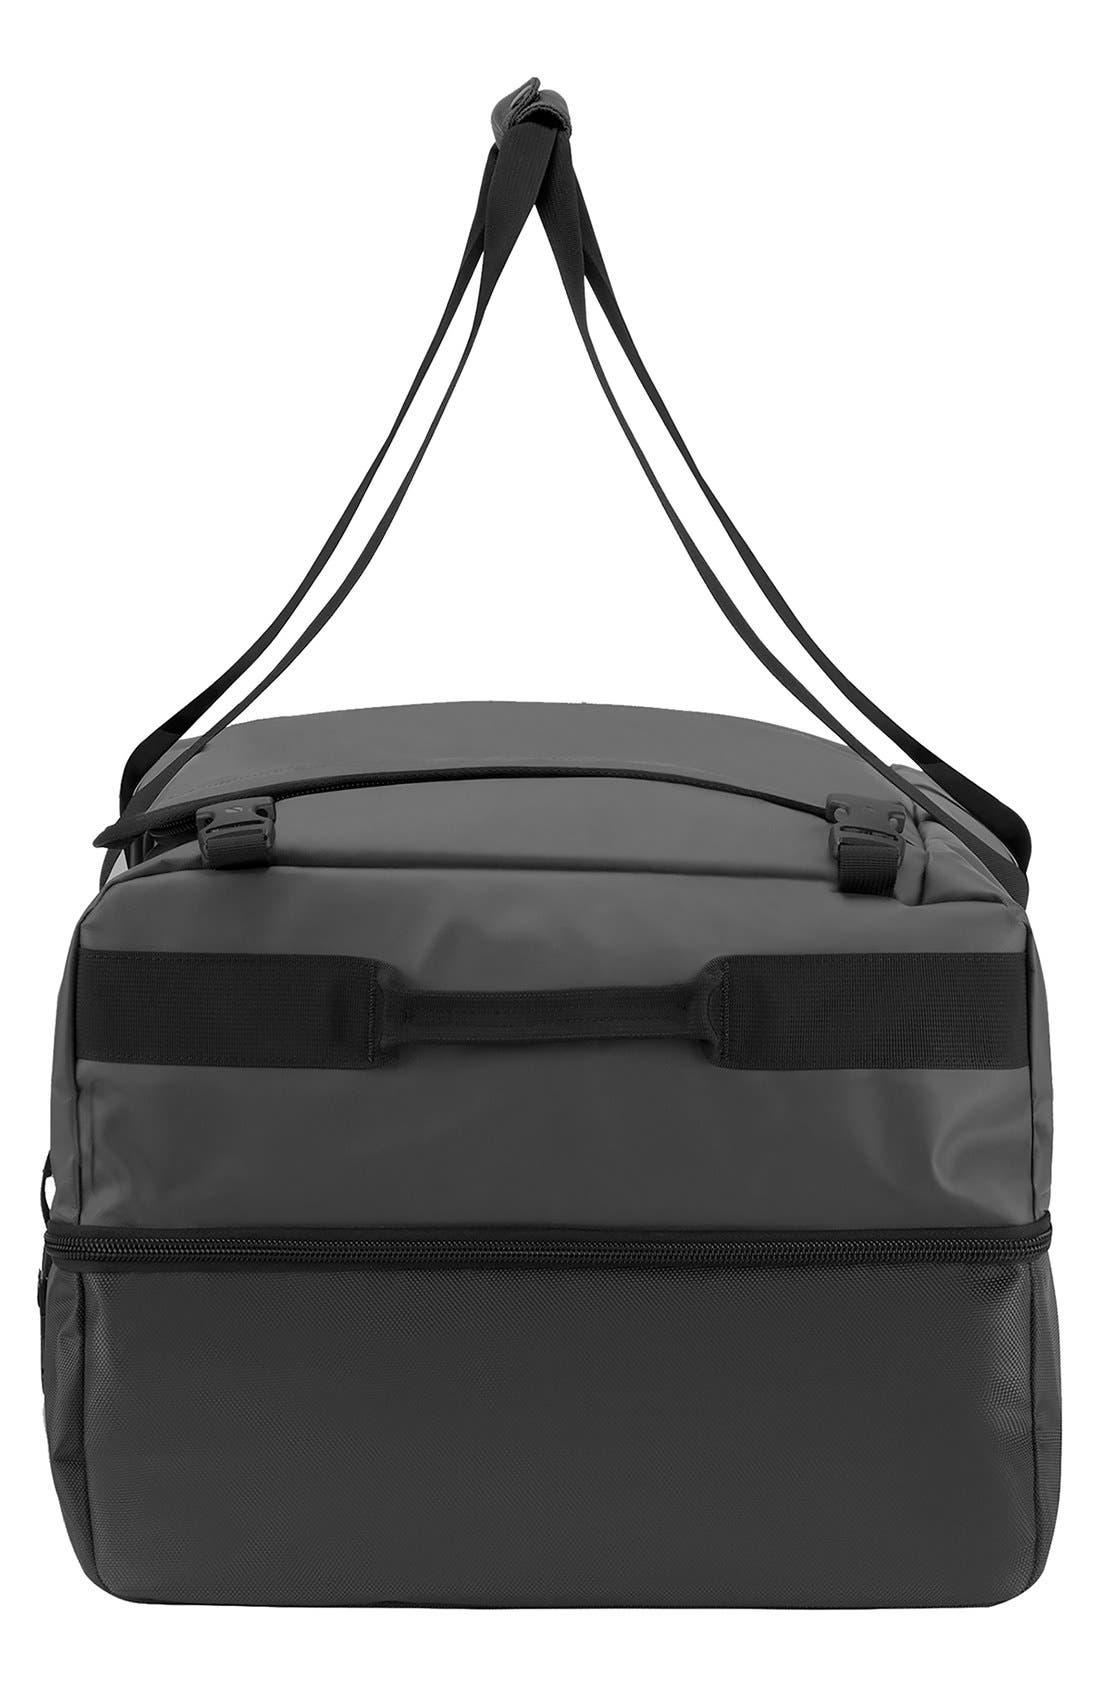 TRACTO Medium Split Convertible Duffel Bag,                             Alternate thumbnail 3, color,                             Black